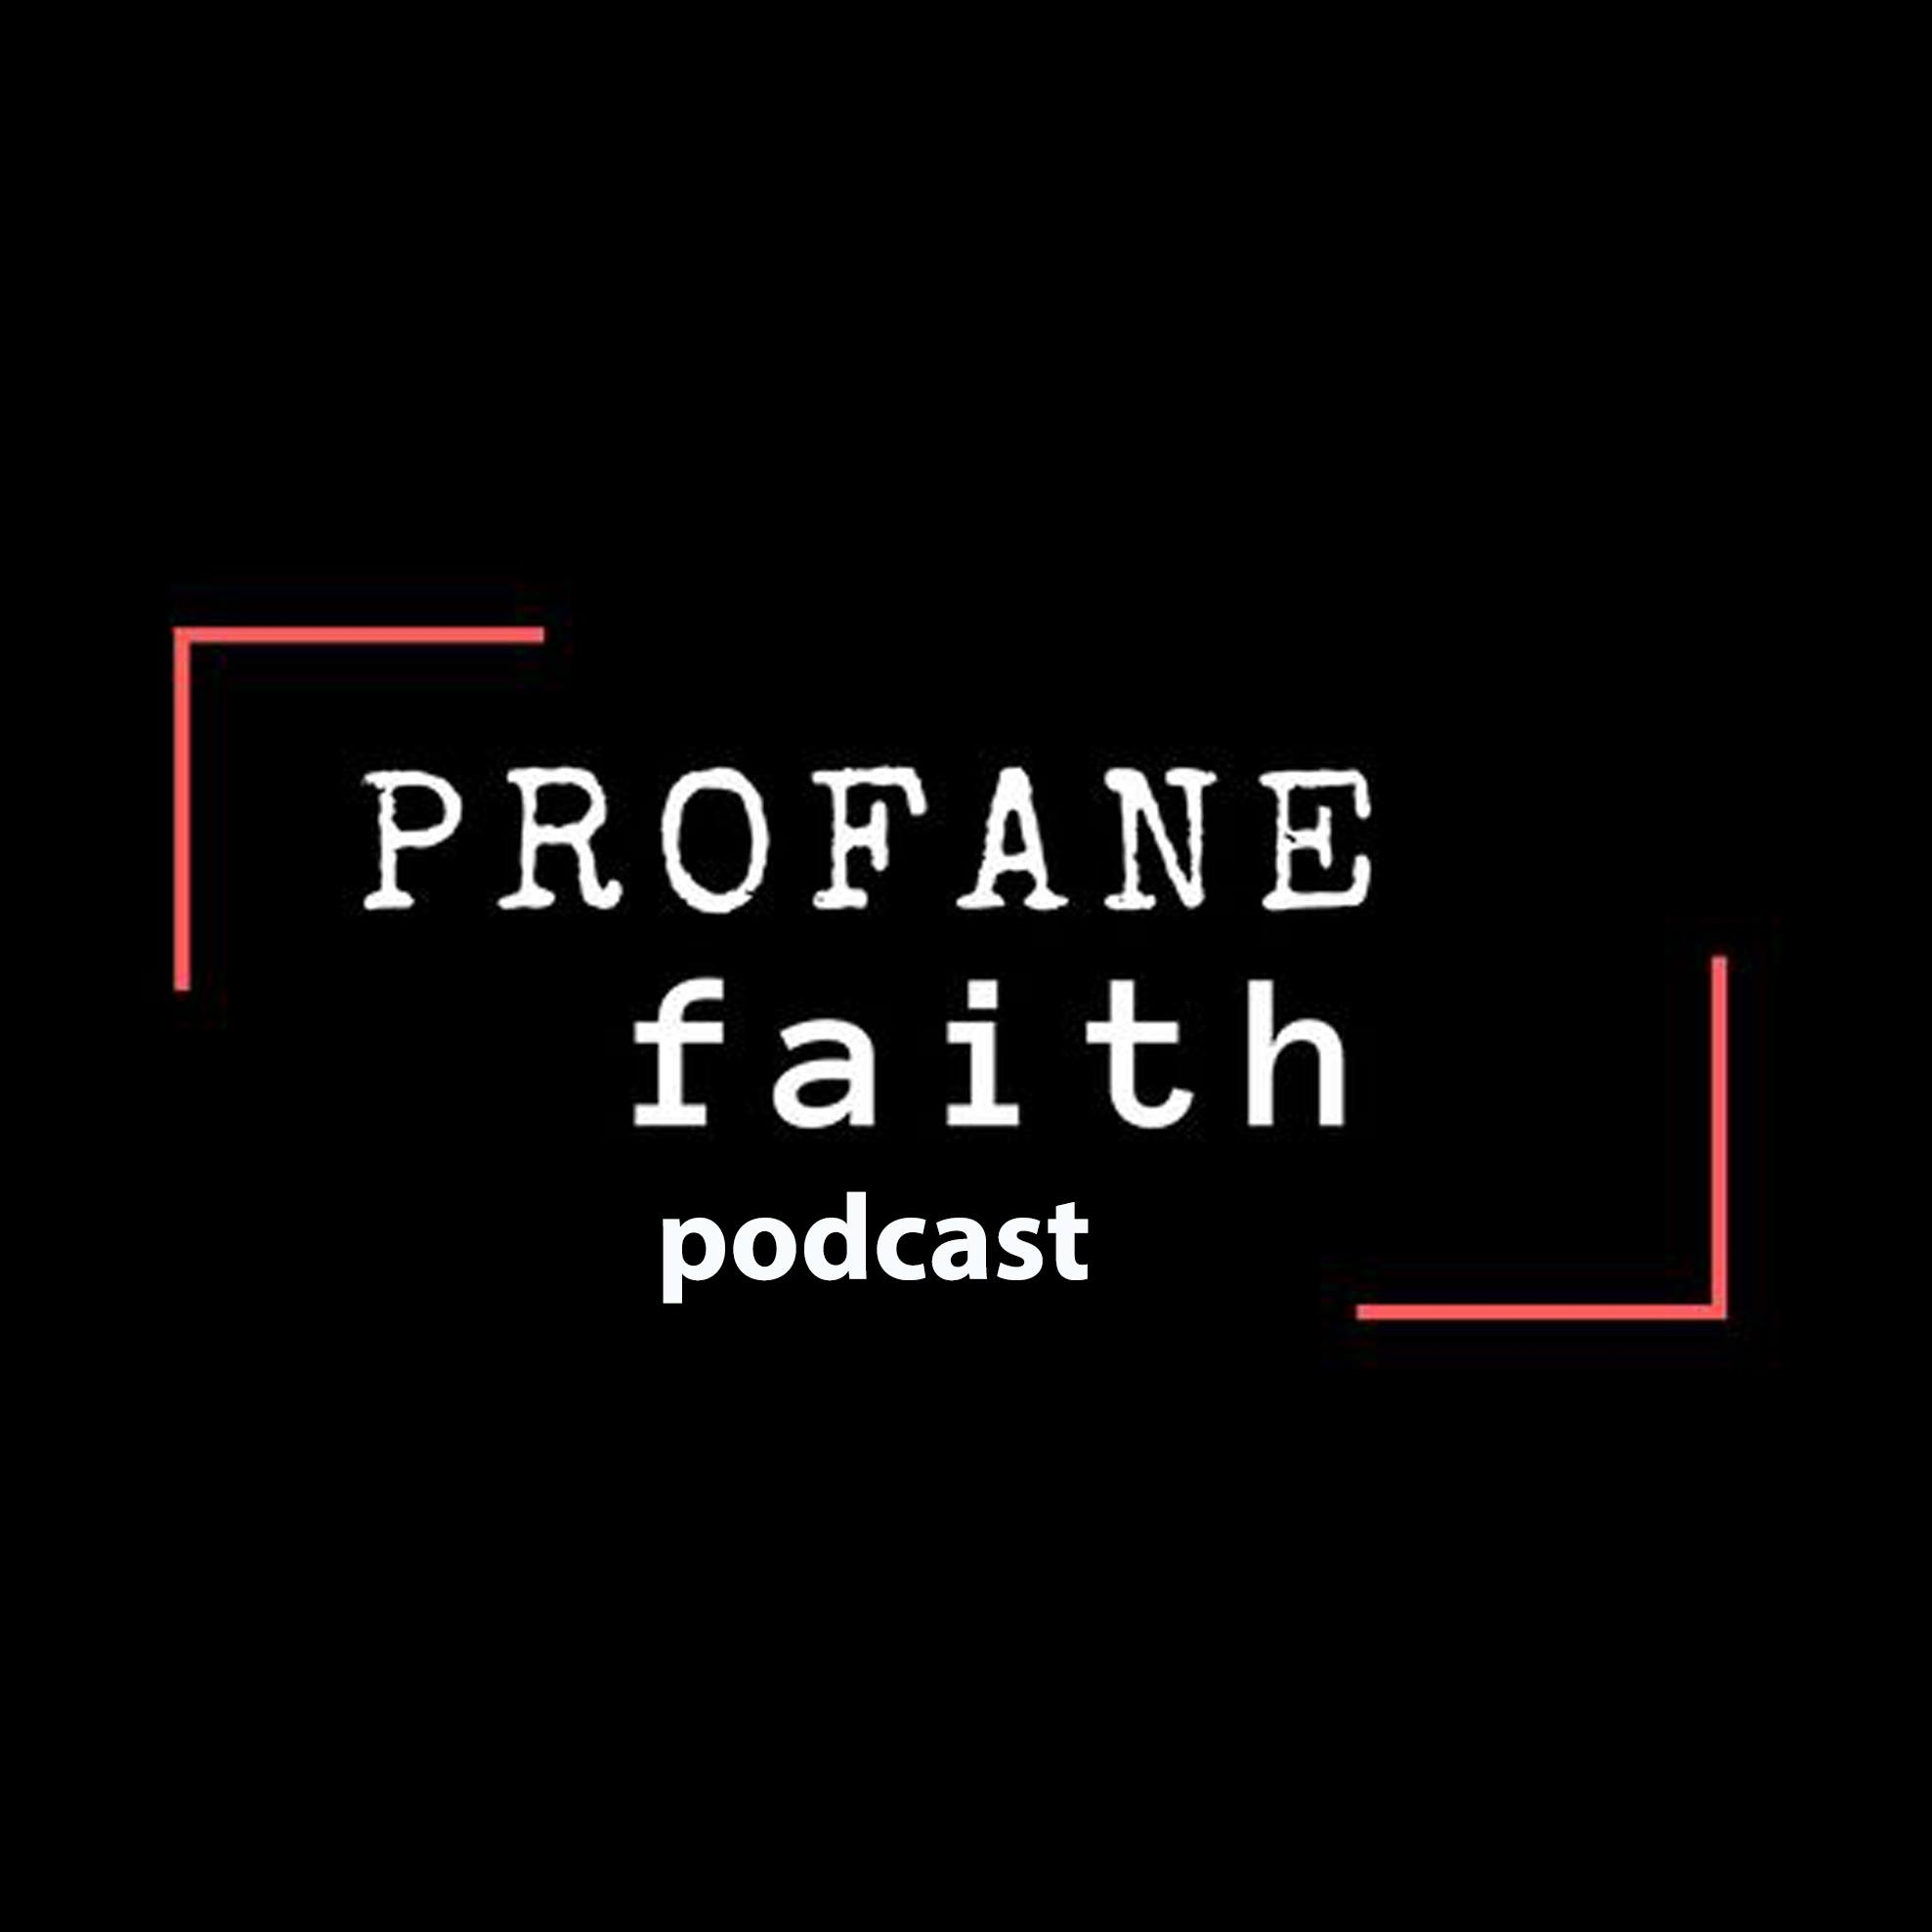 Profane Faith Podcast with Dan White Hodge